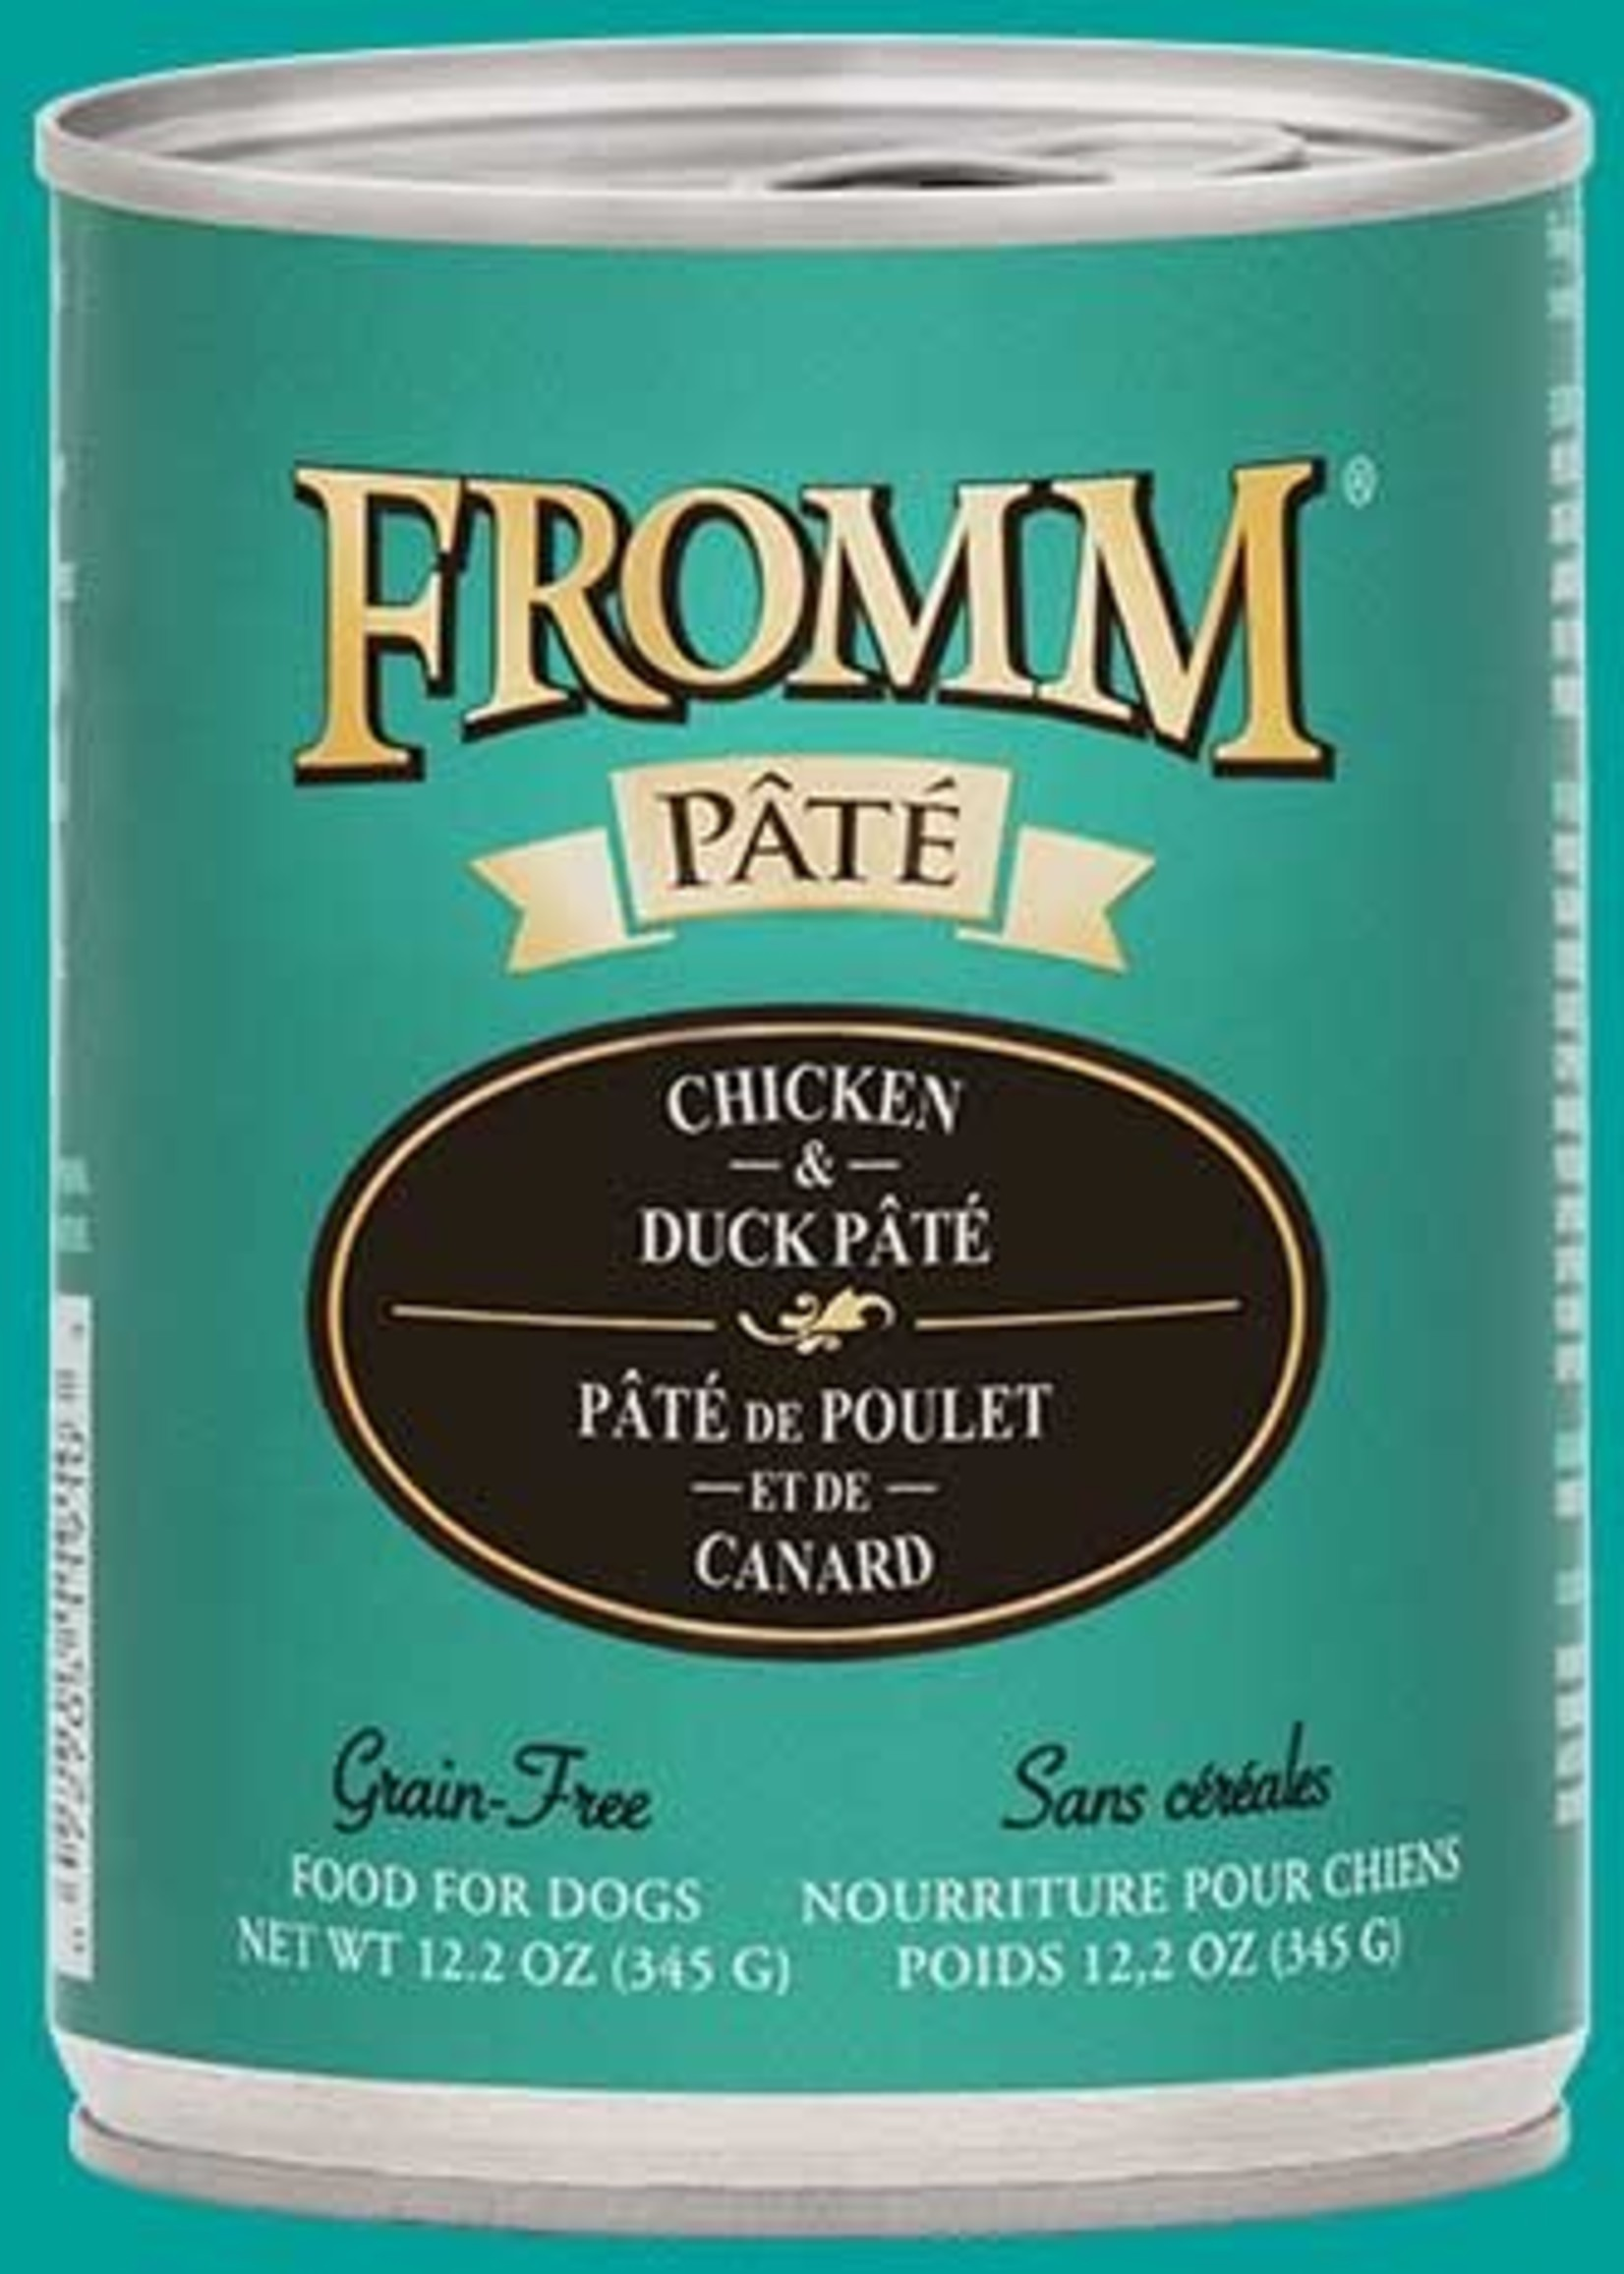 Fromm Fromm GF Chicken & Duck Pâté 12oz